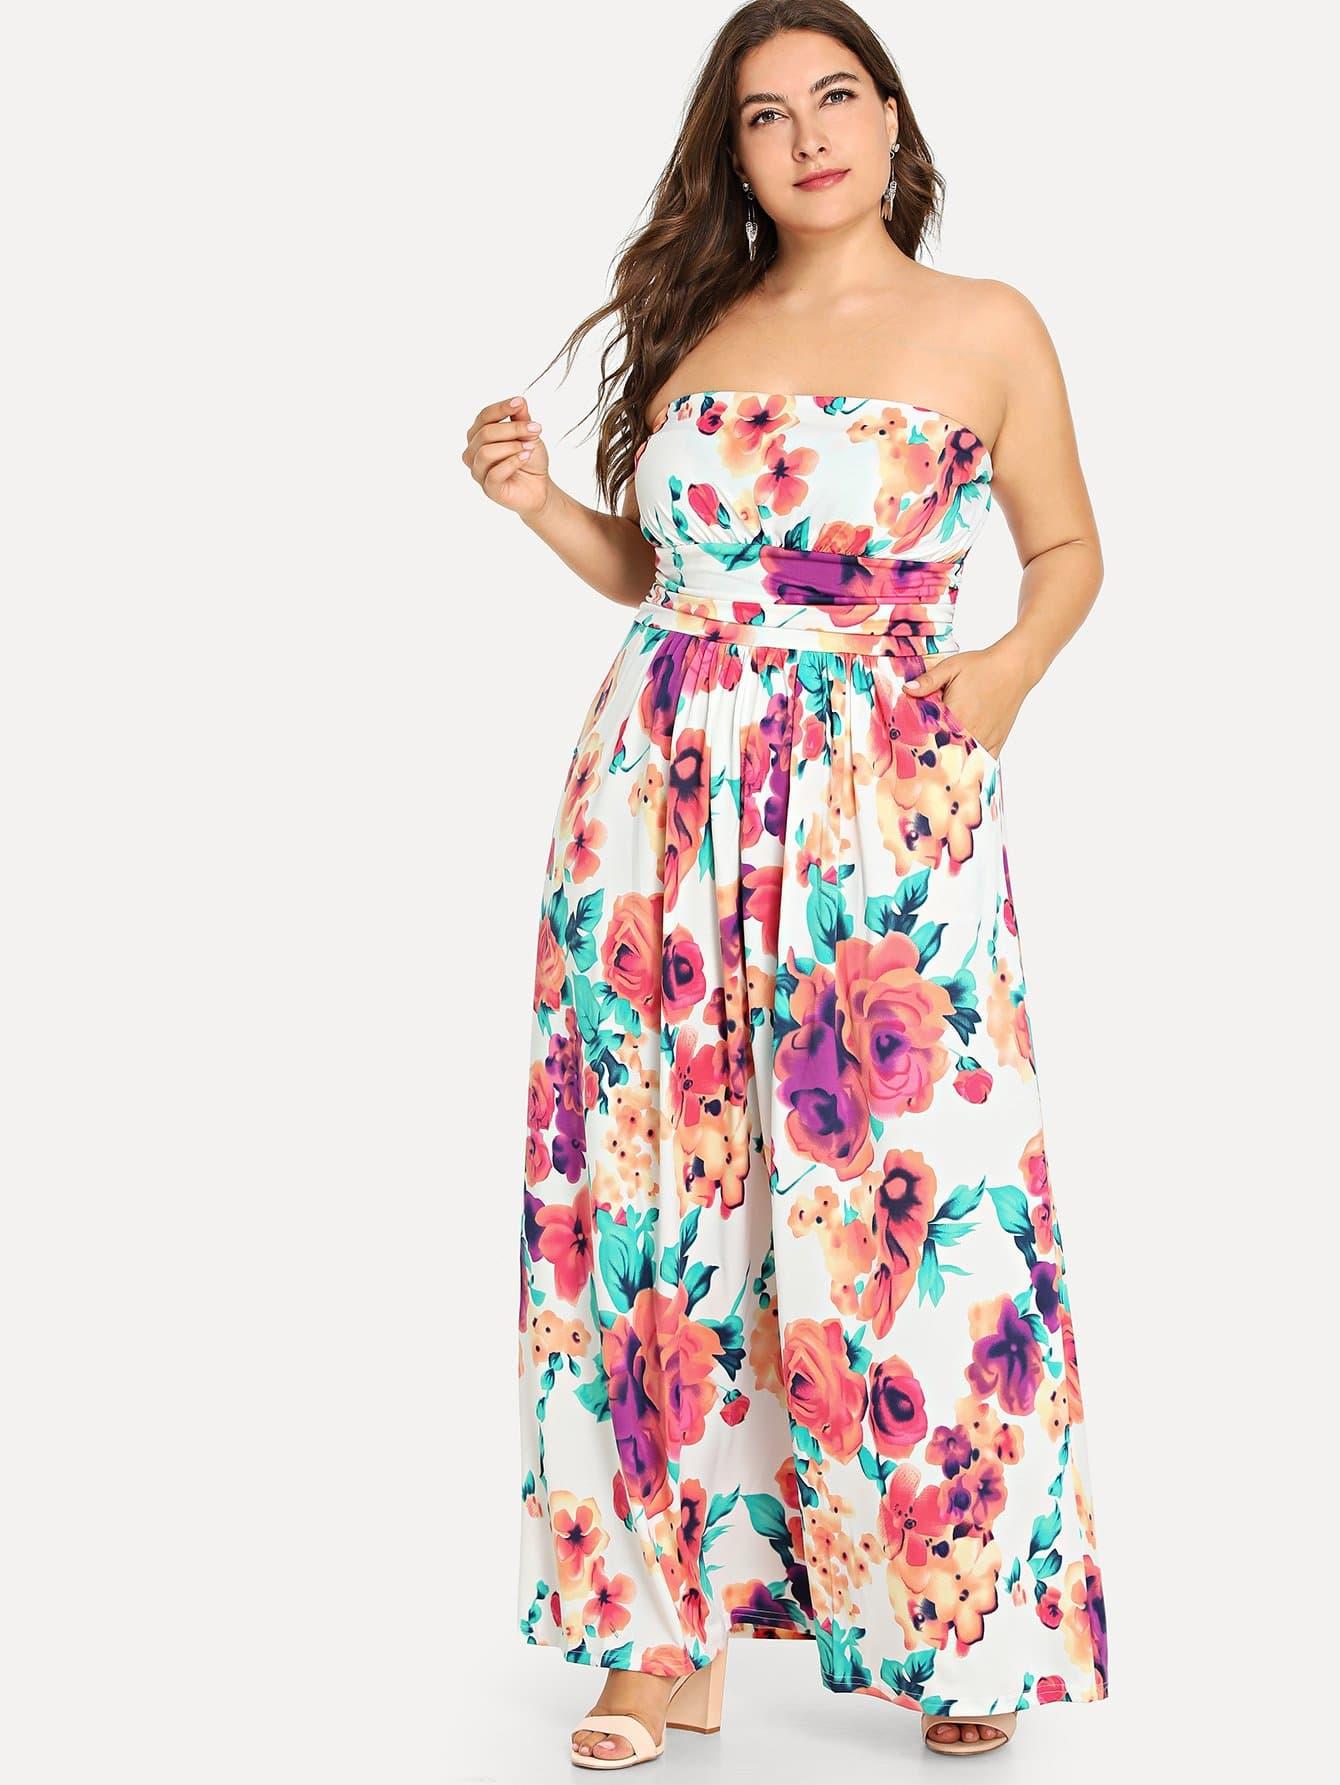 Купить Большое ситцевое платье без бретелек, Franziska, SheIn